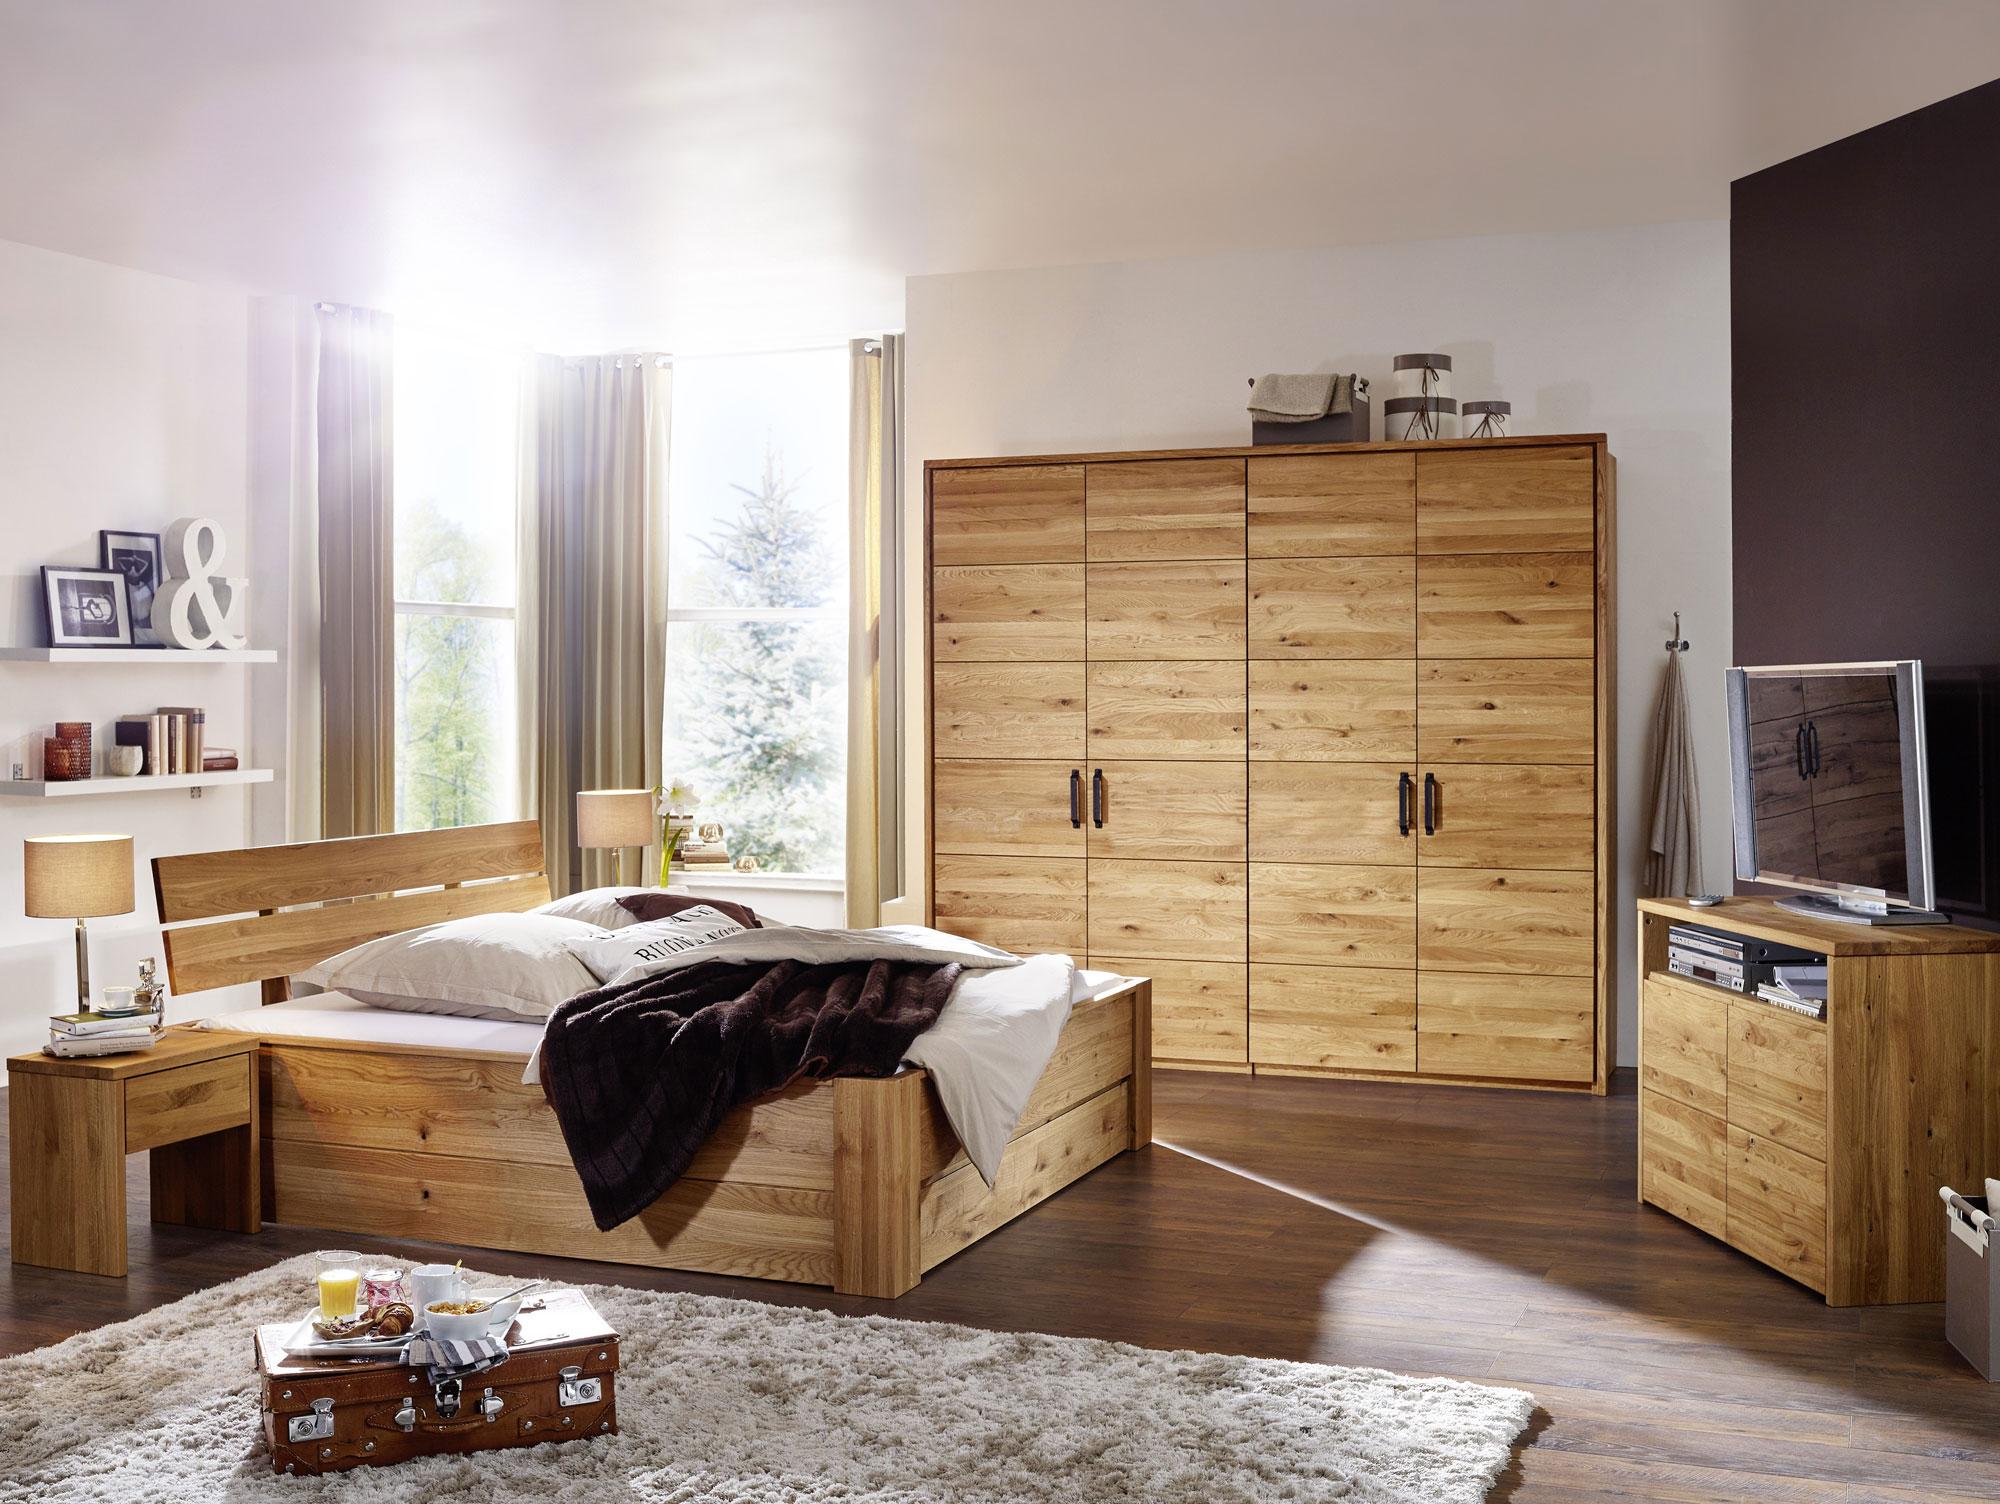 SALVADOR Massivholz Kleiderschrank Wildeiche geölt 180 cm 3-türig